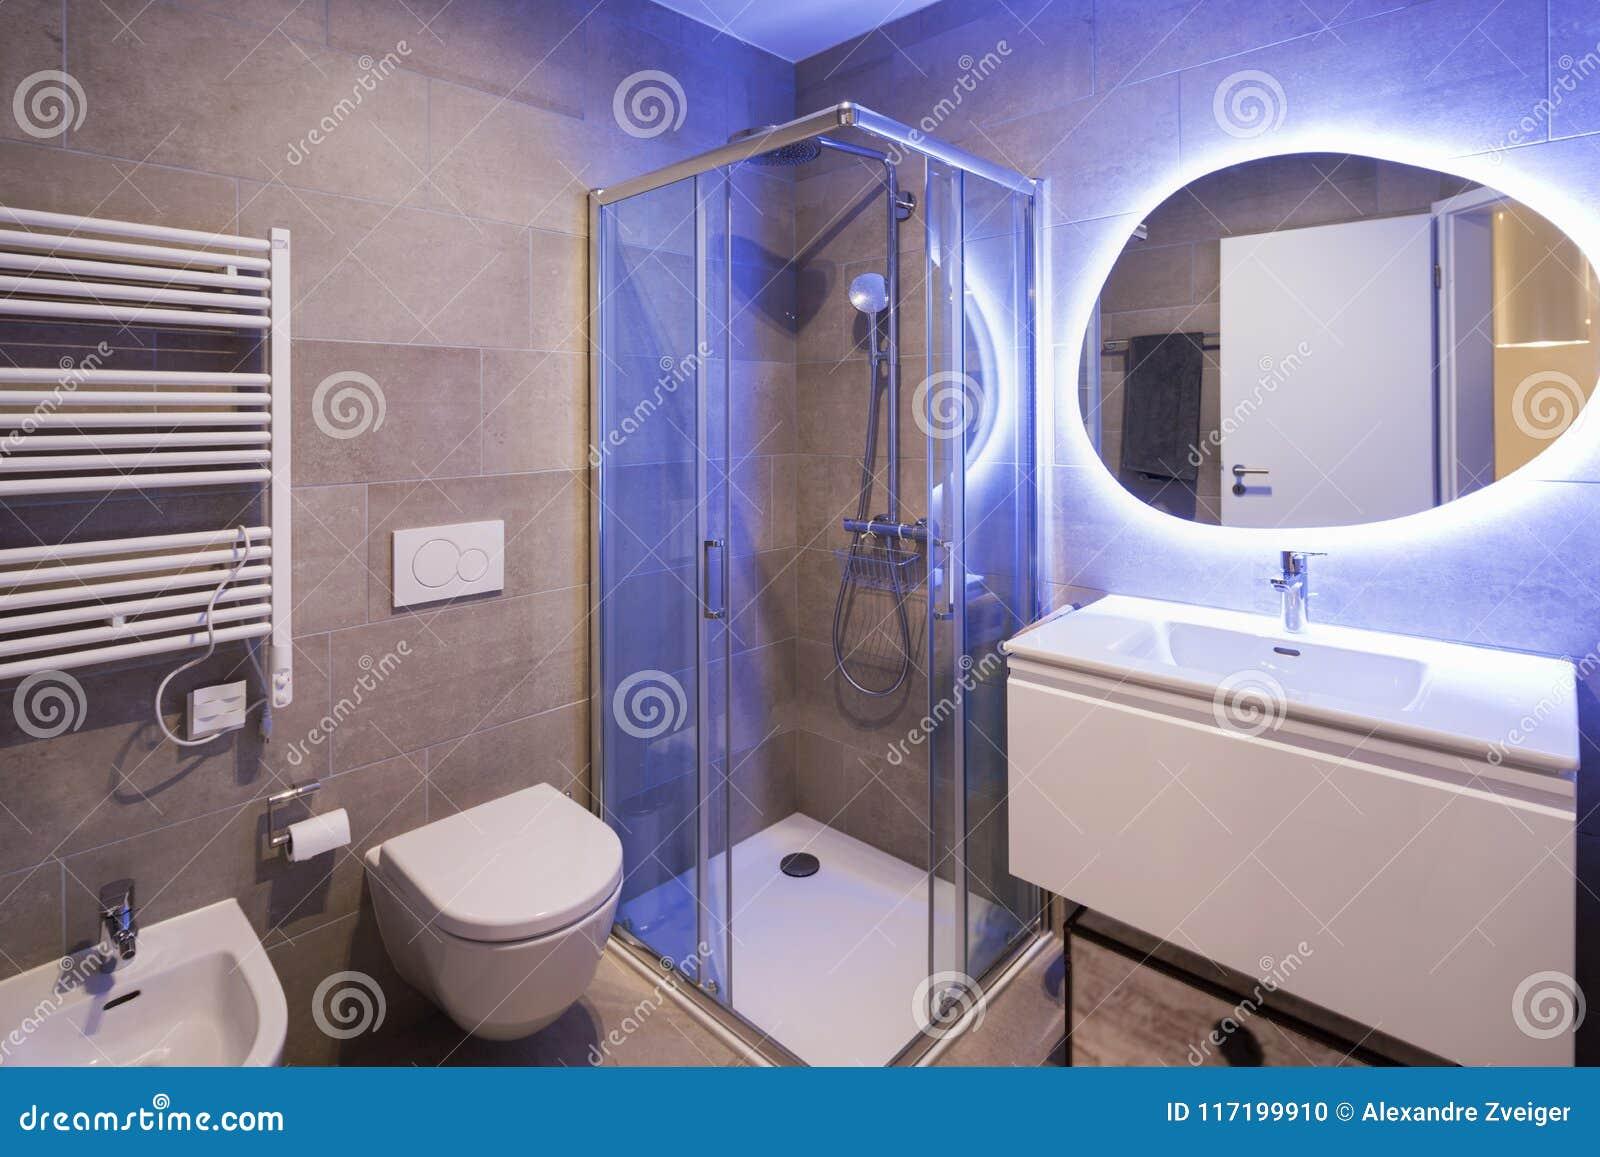 Download Modern Marble Bathroom With Backlit Mirror Stock Photo - Image of violet bidet: & Modern Marble Bathroom With Backlit Mirror Stock Photo - Image of ...